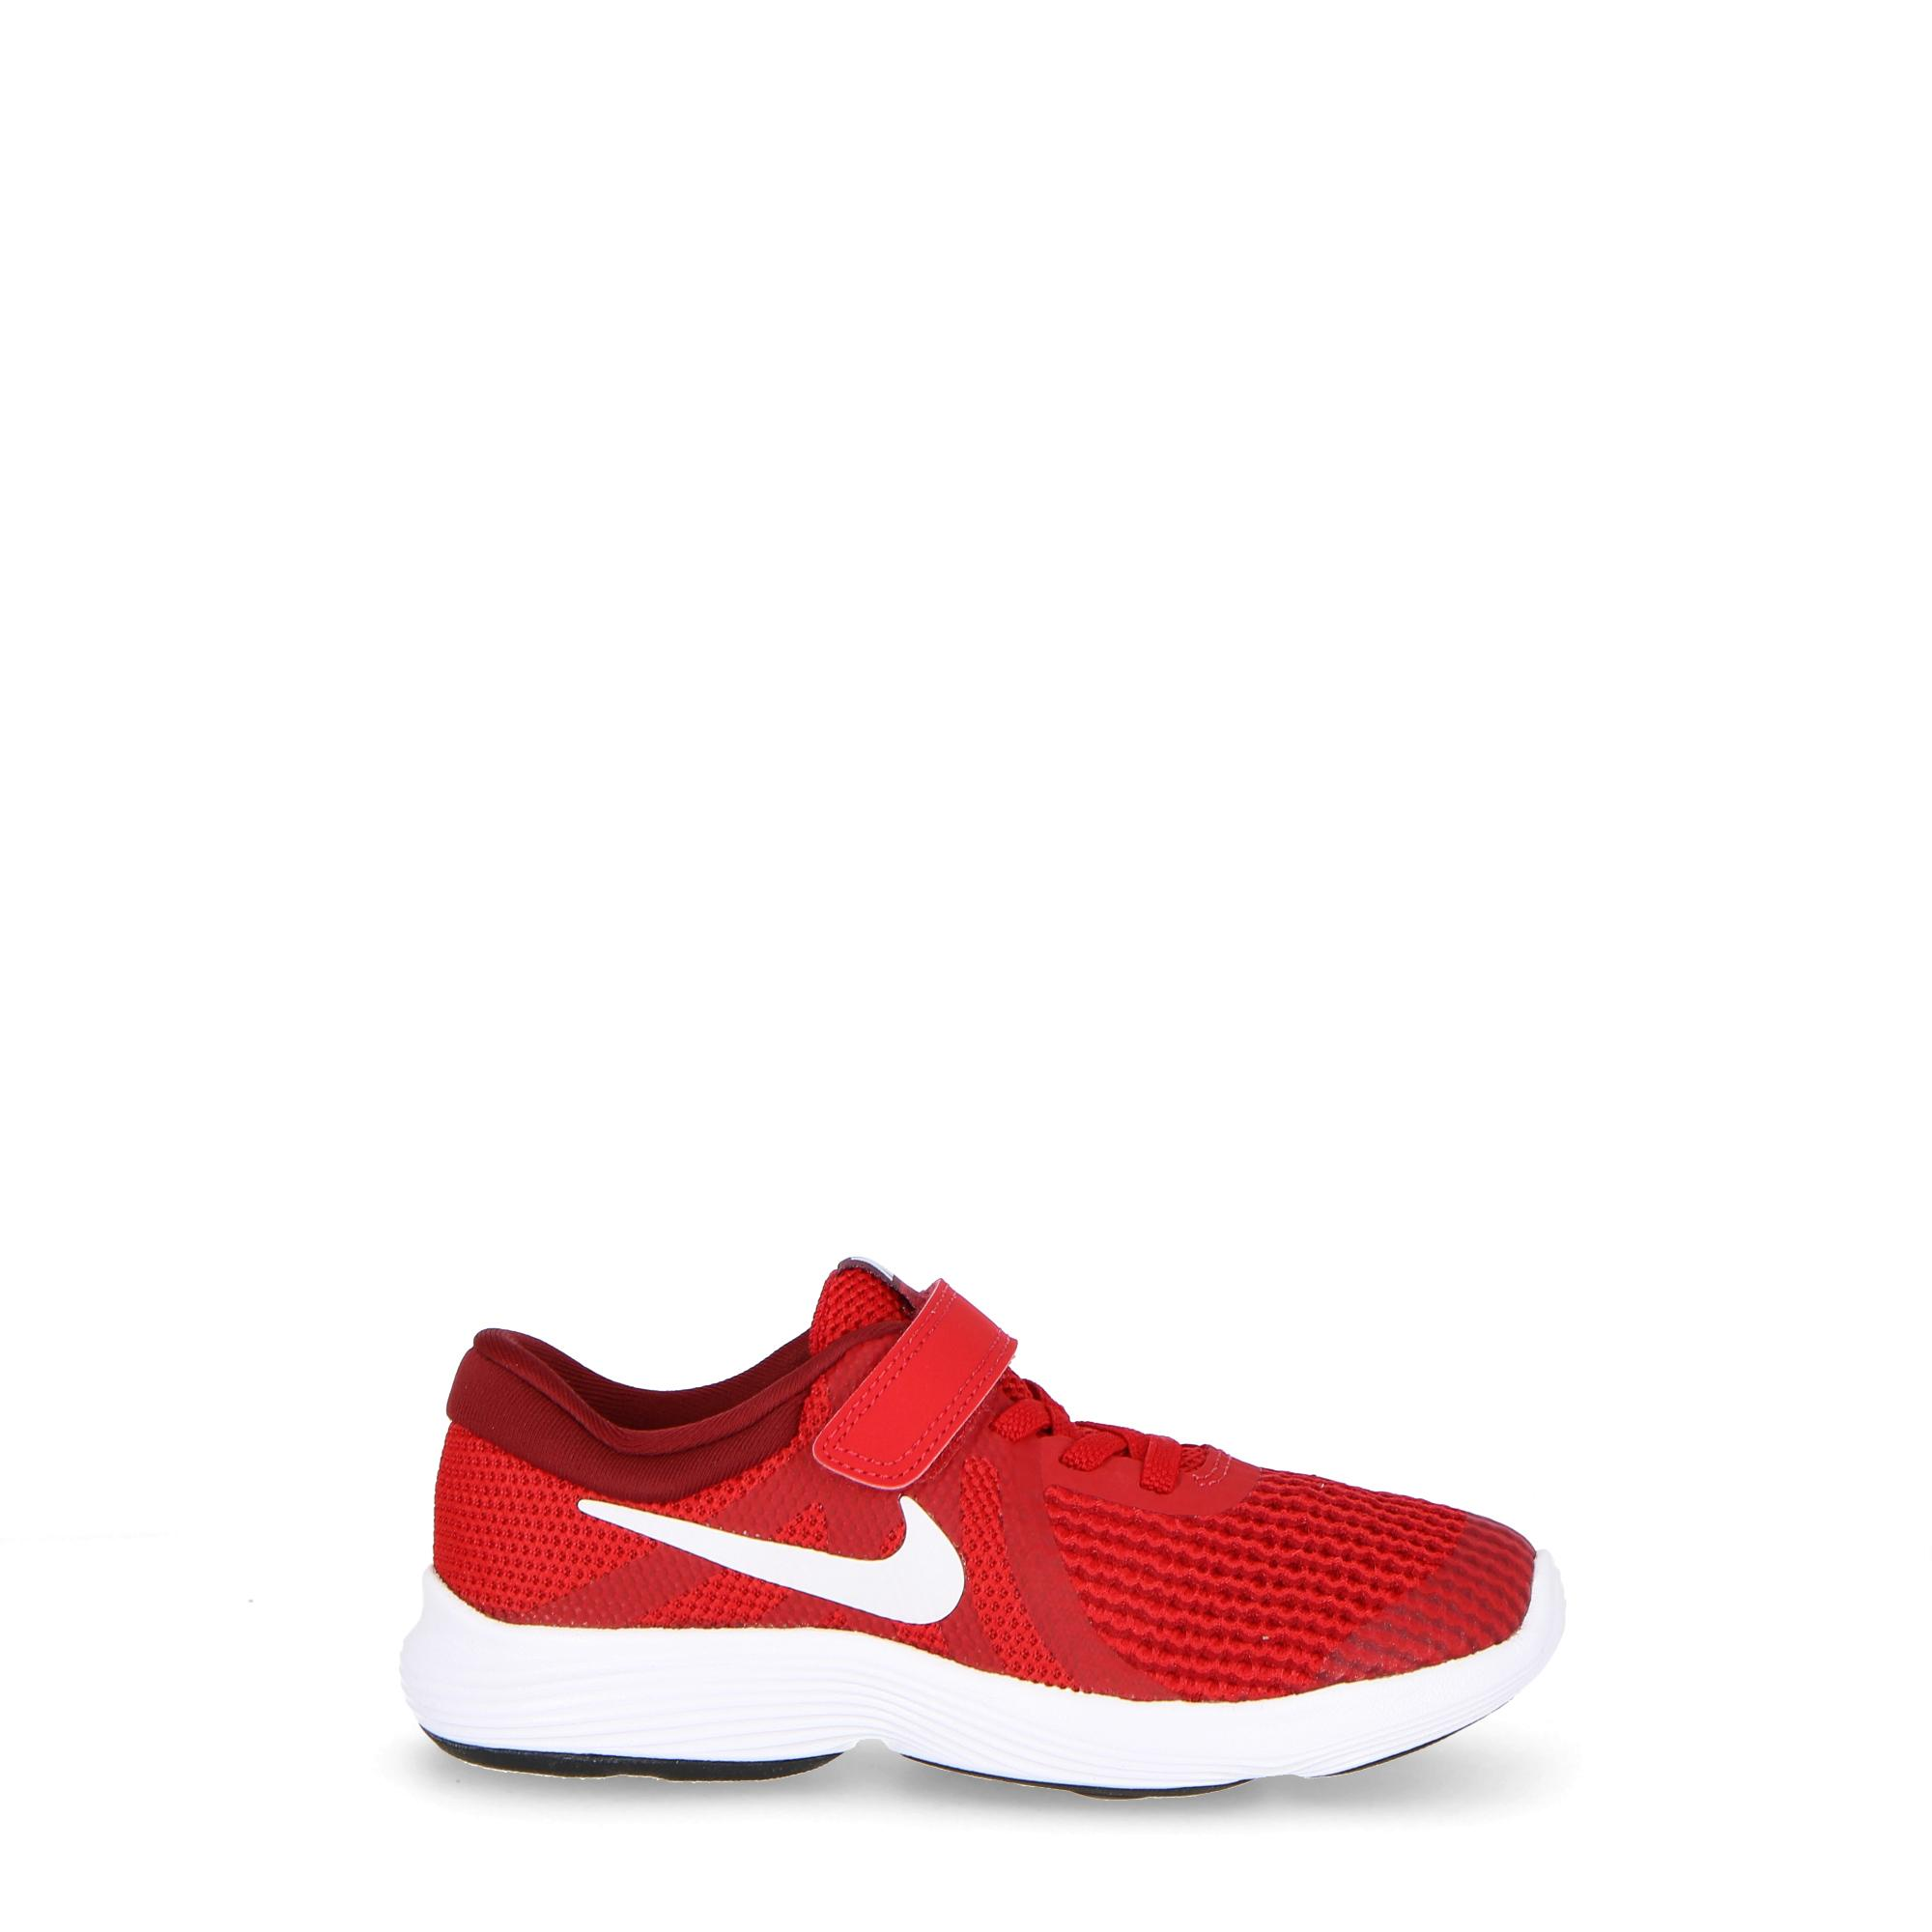 best website 2c5cd 9d0c8 Nike Revolution 4 (psv) - Kids Gym red white